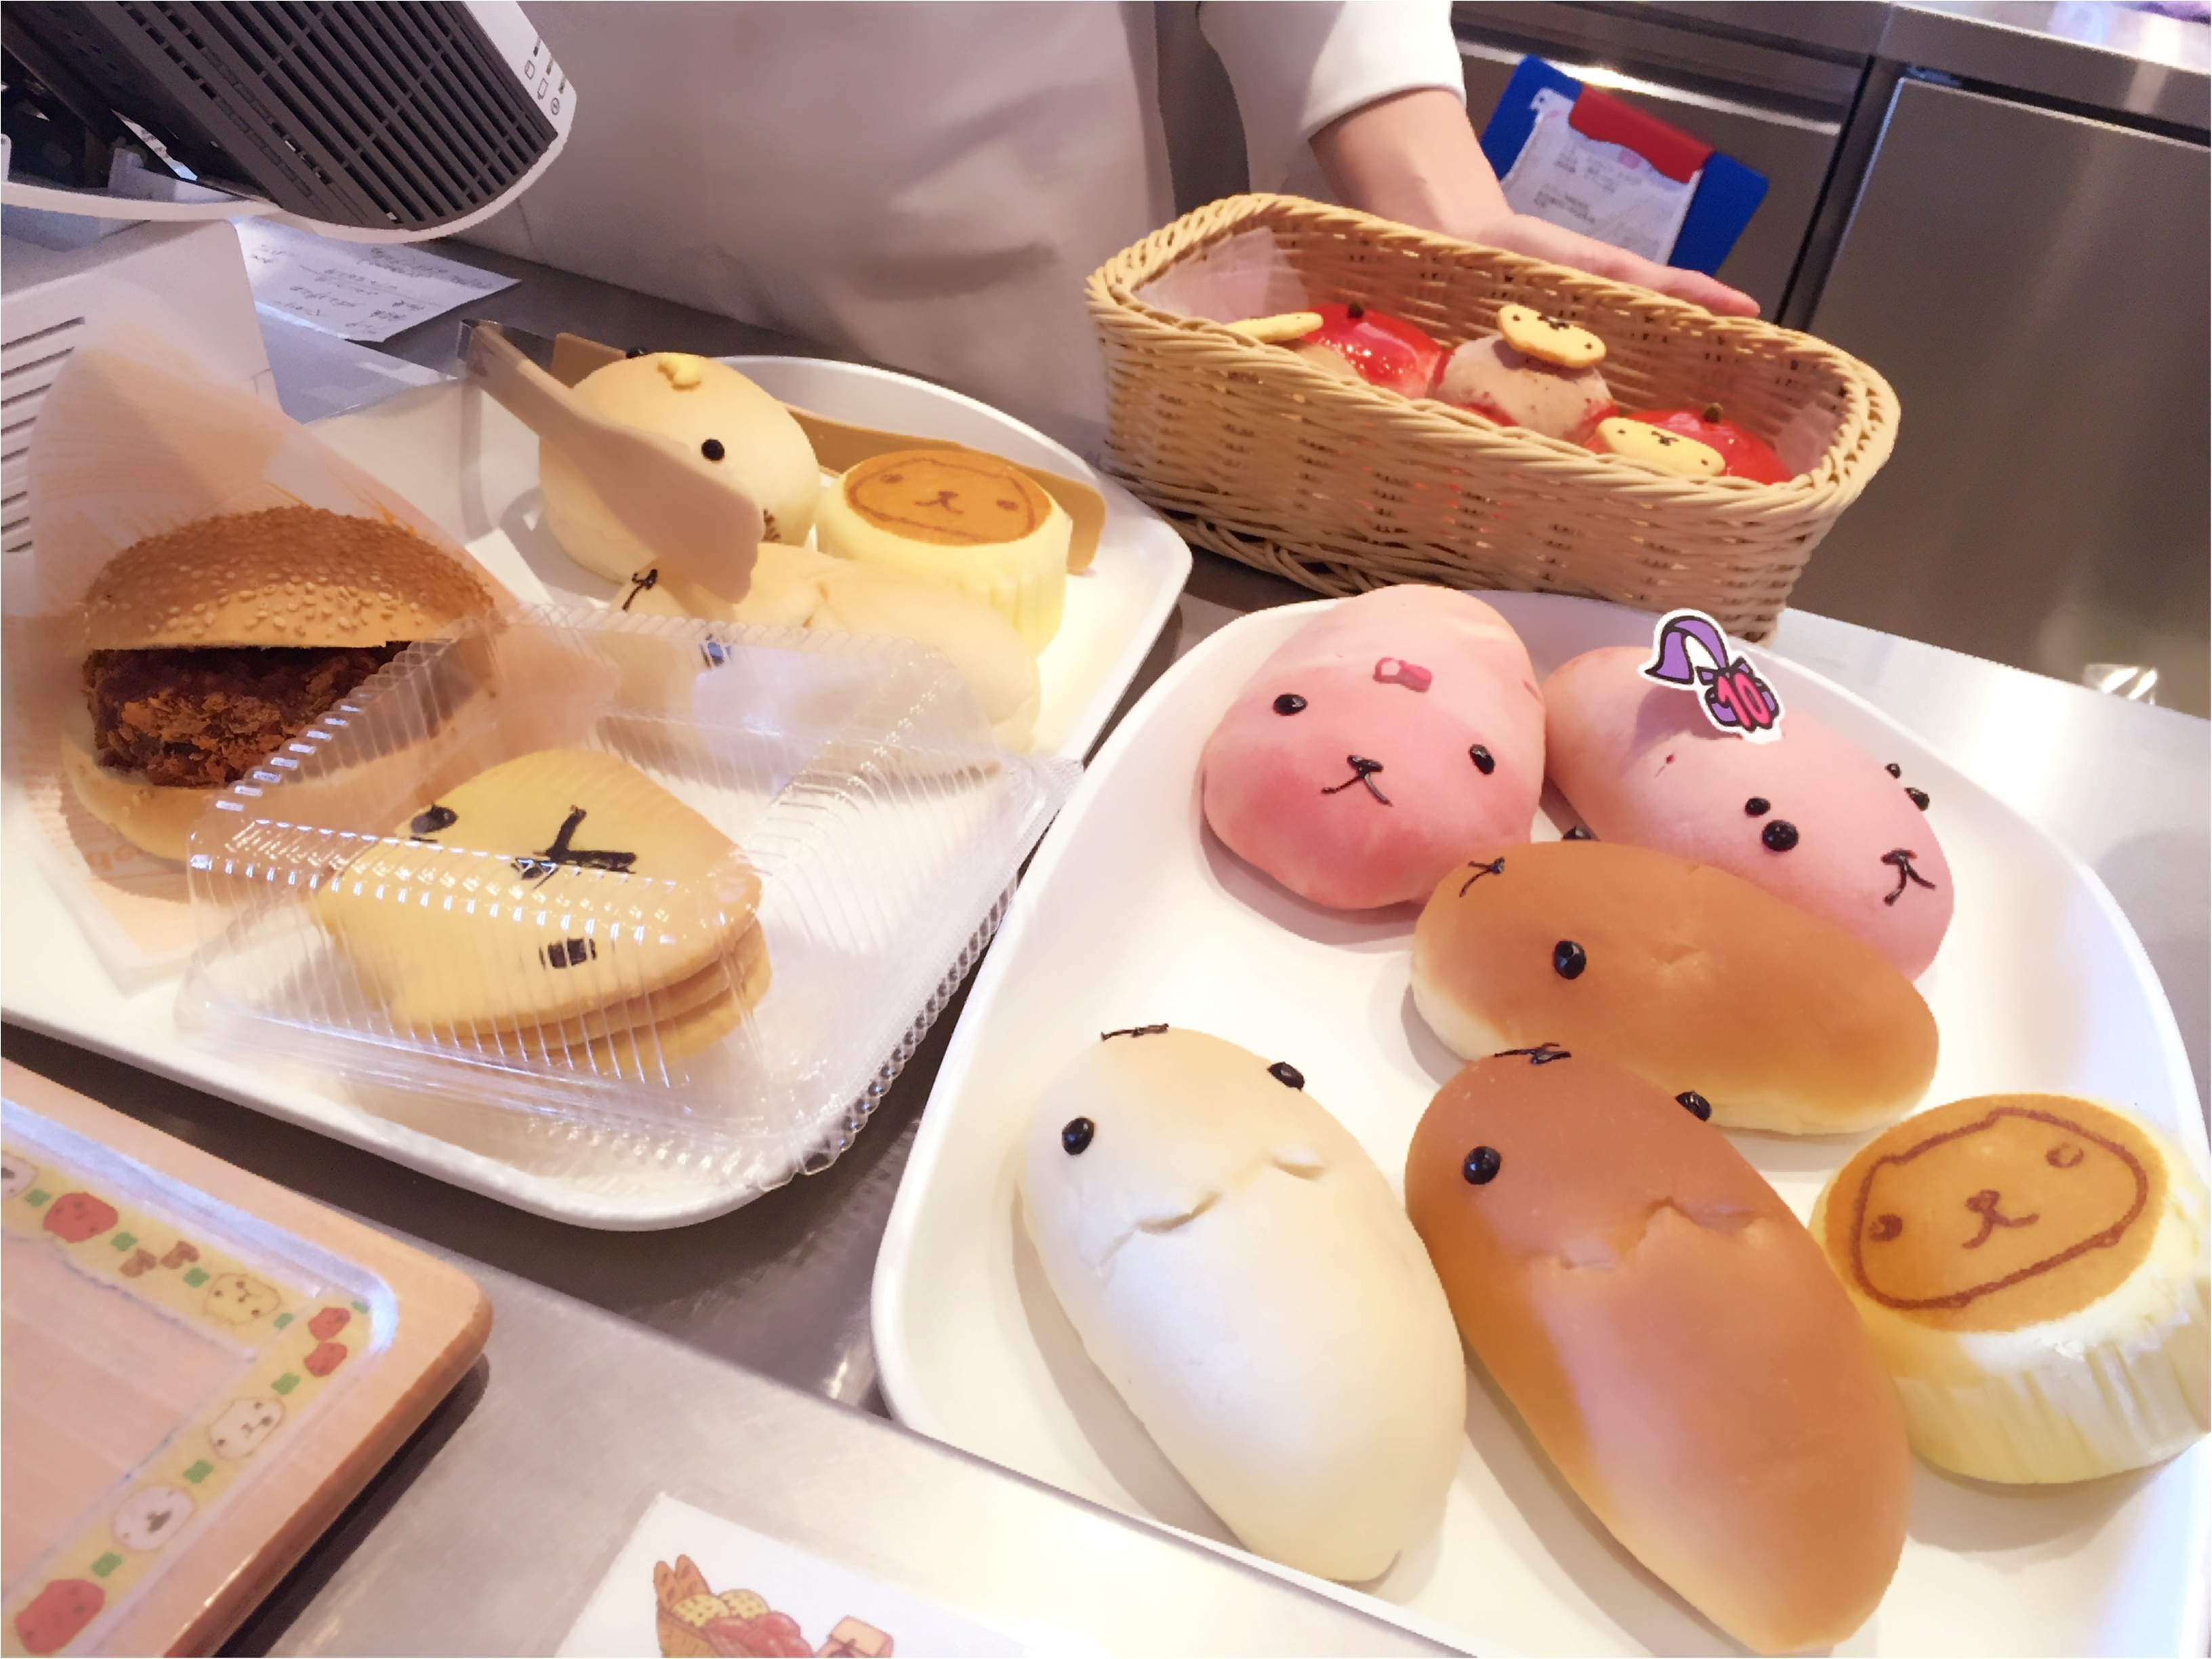 BC-bakery♡カピバラさんパン屋さん_4